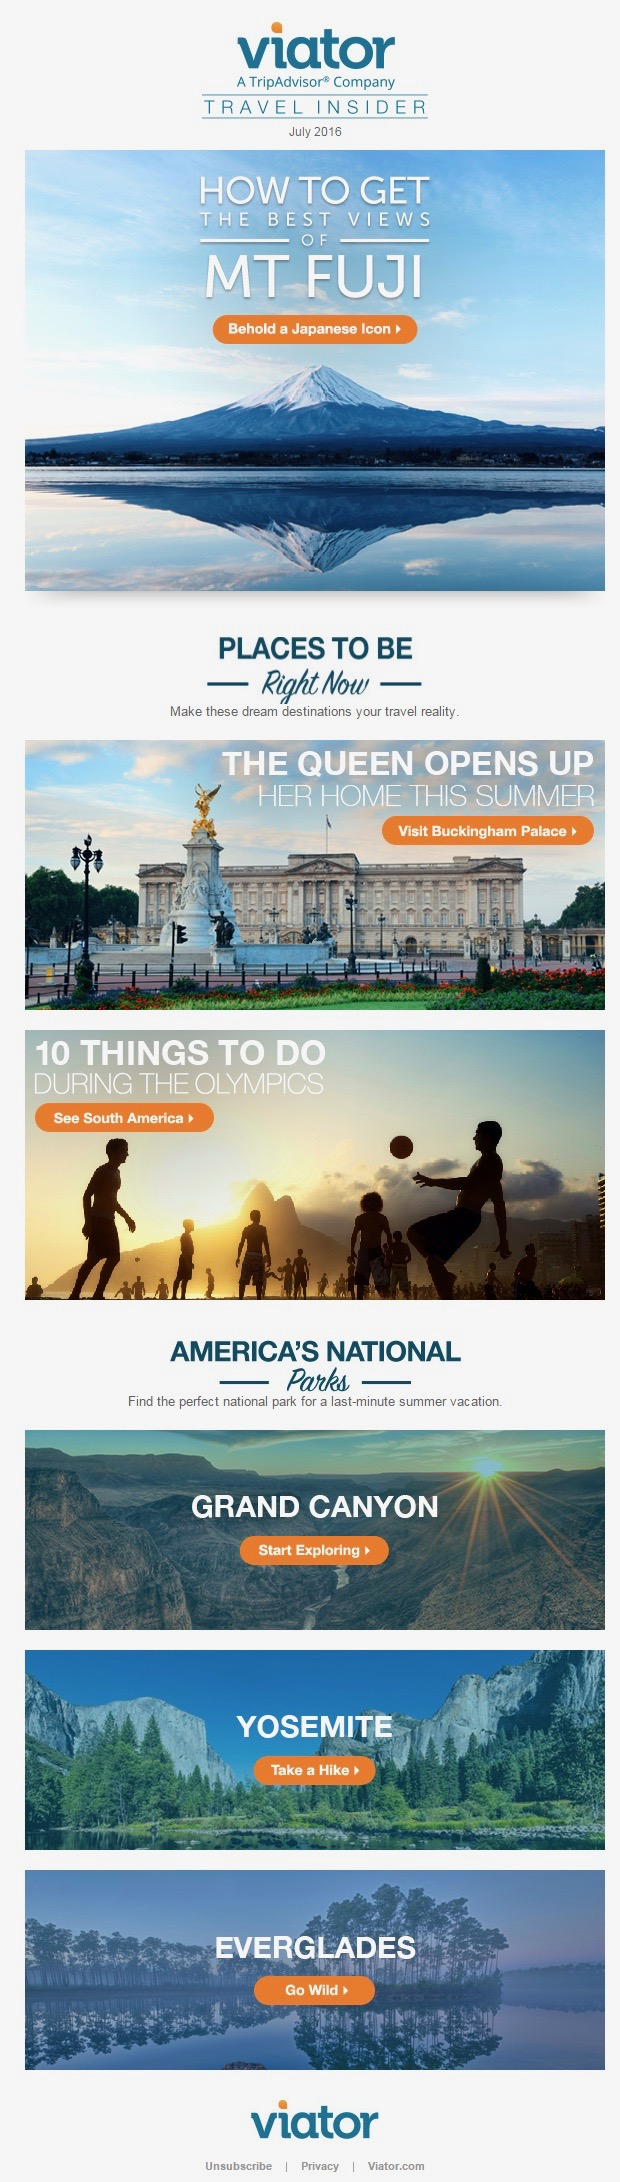 Travel Insider - July 2016 (National Parks).jpg